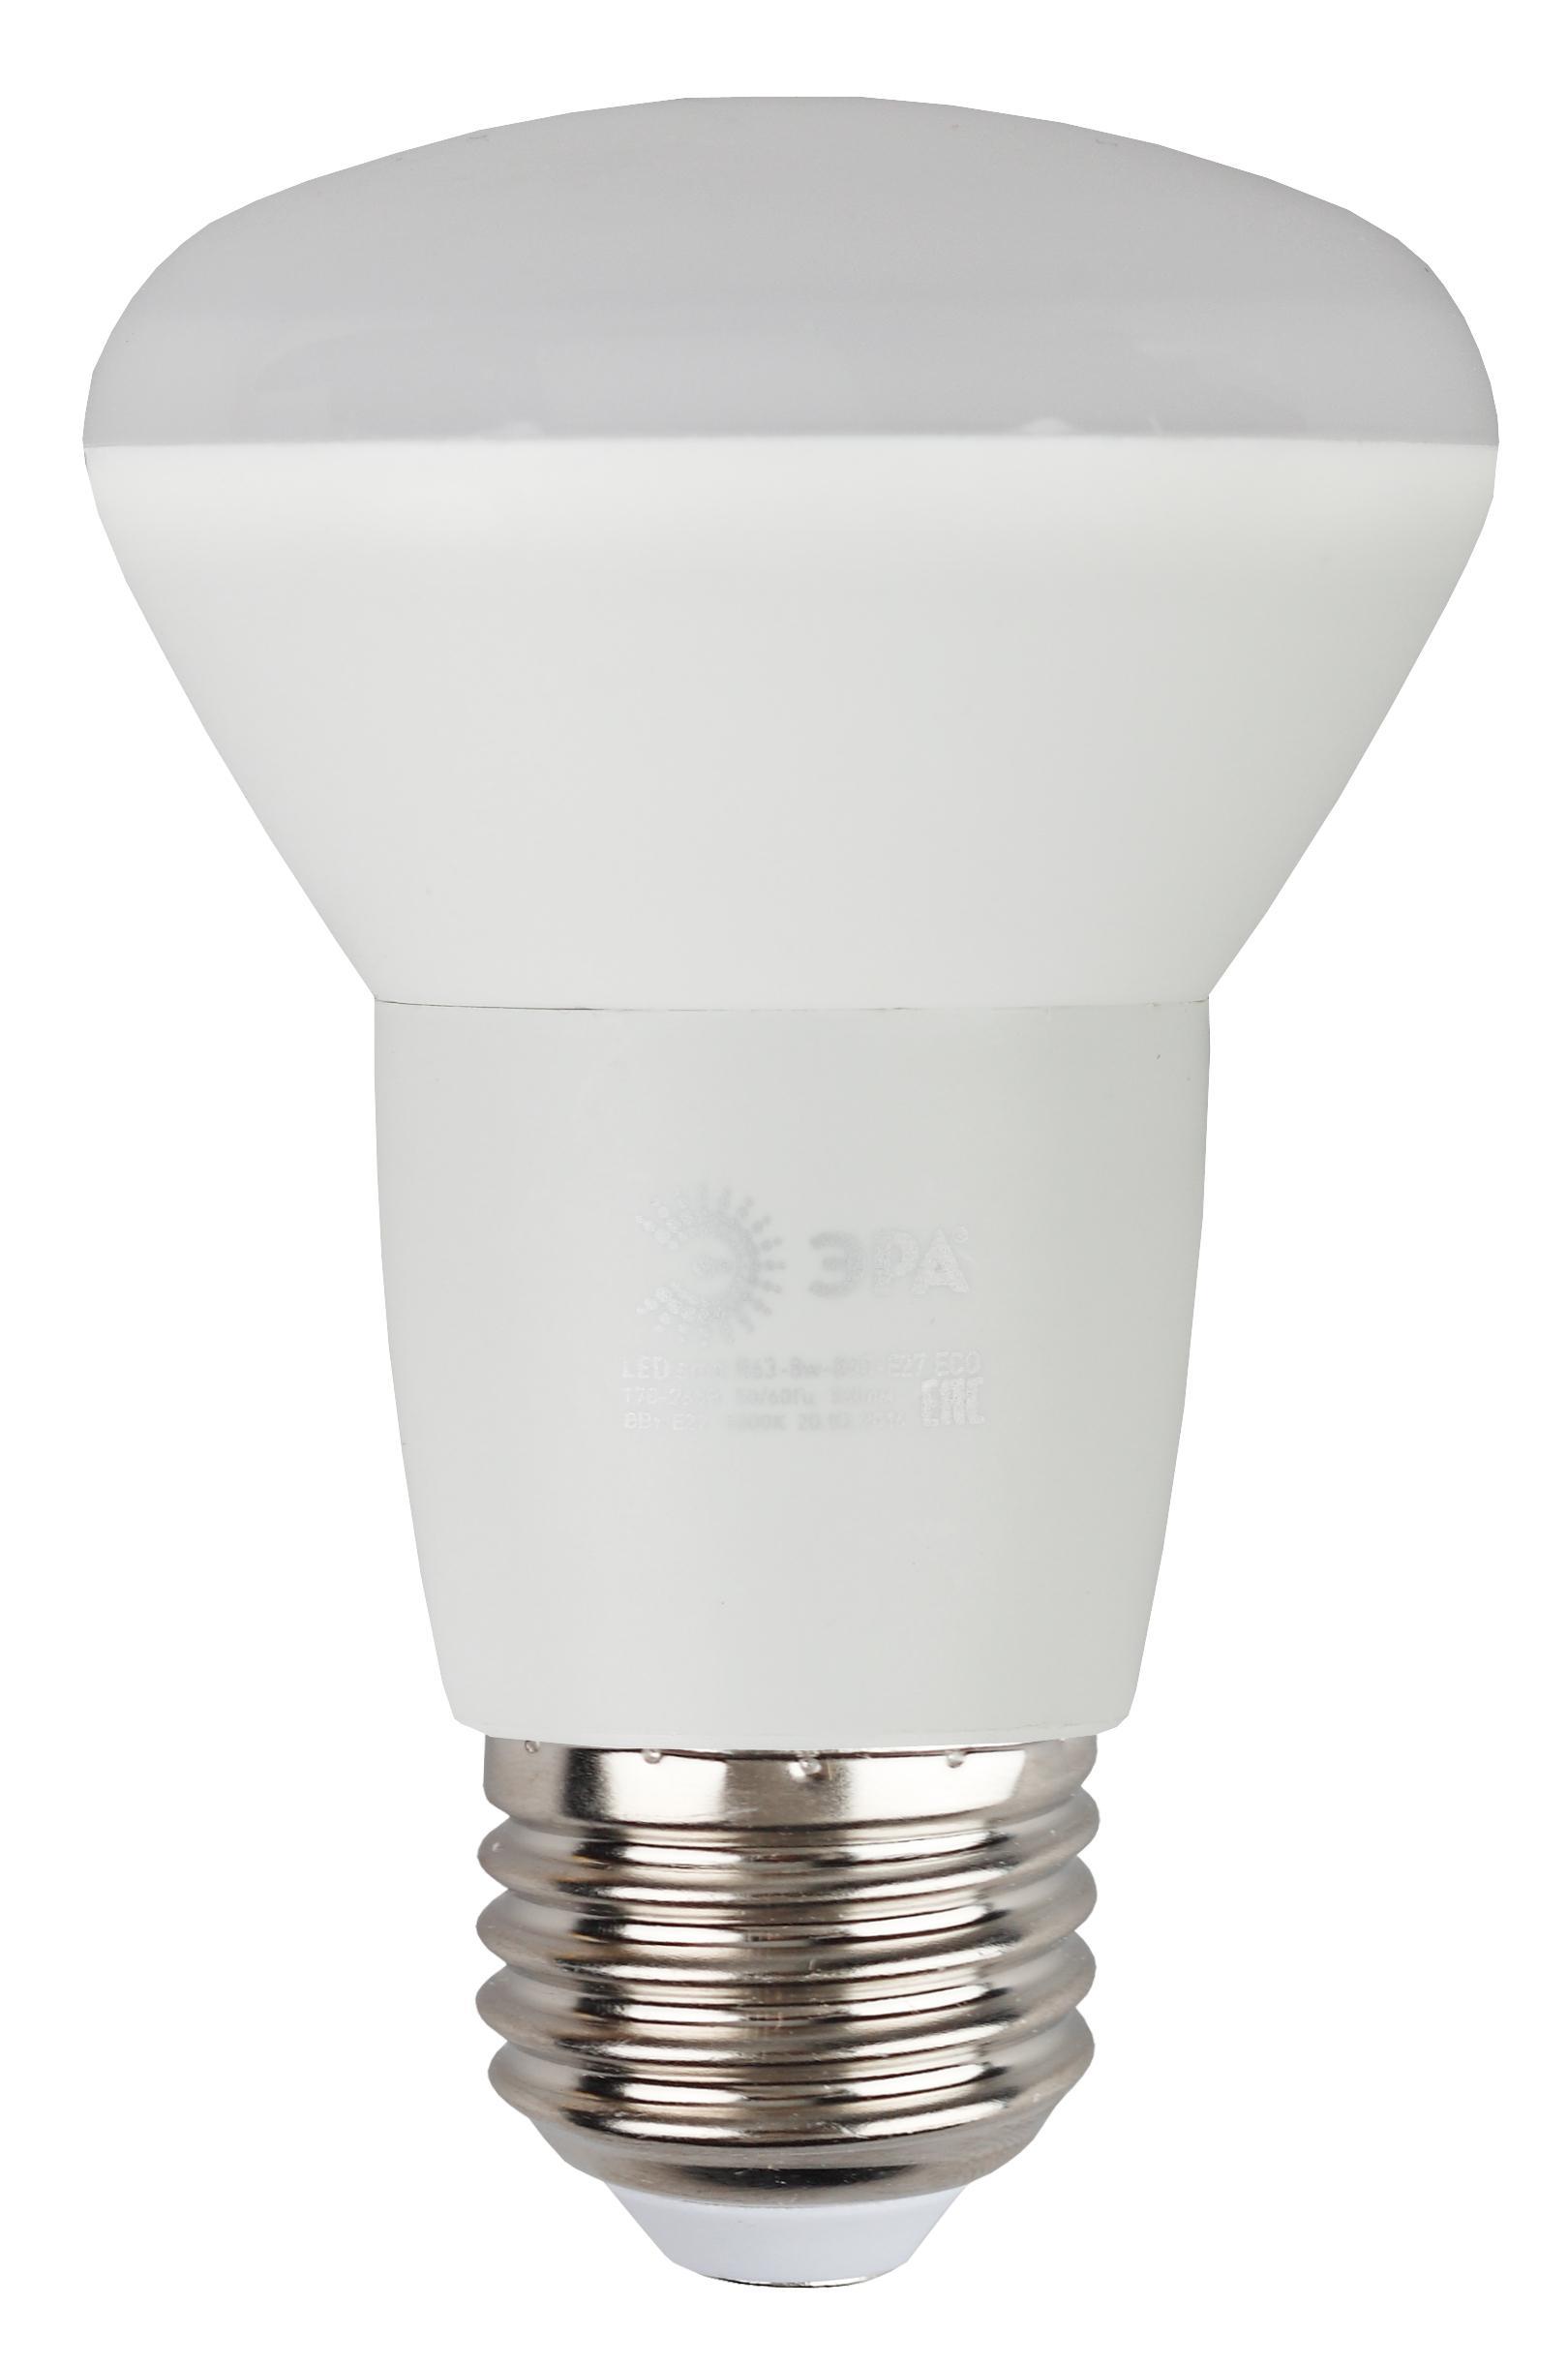 Лампа светодиодная ЭРА Led smd r63-8w-840-e27 eco